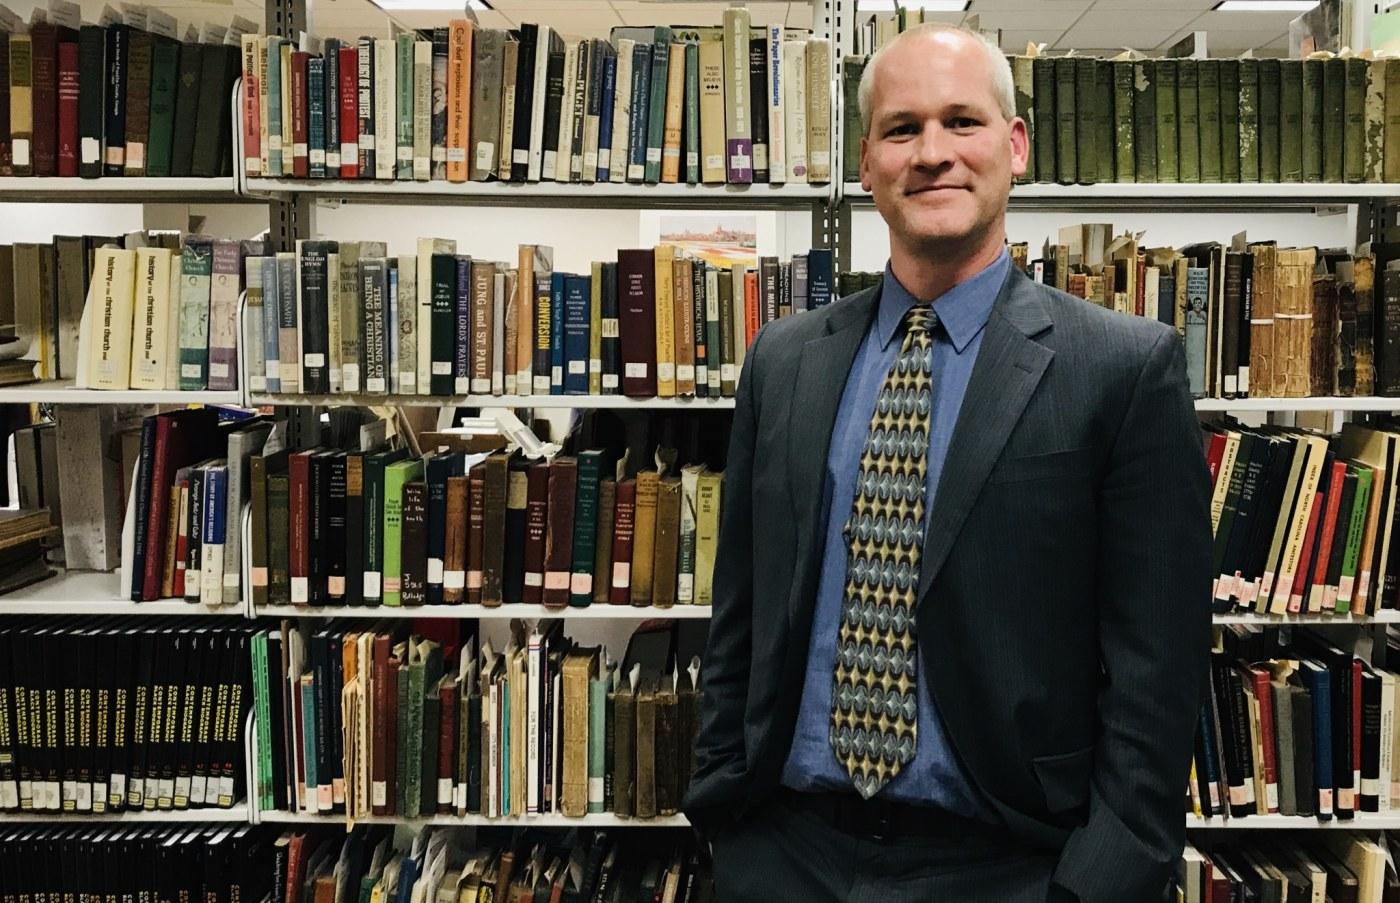 Birmingham, Alabama, Jefferson County Library Cooperative, Tobin Cataldo